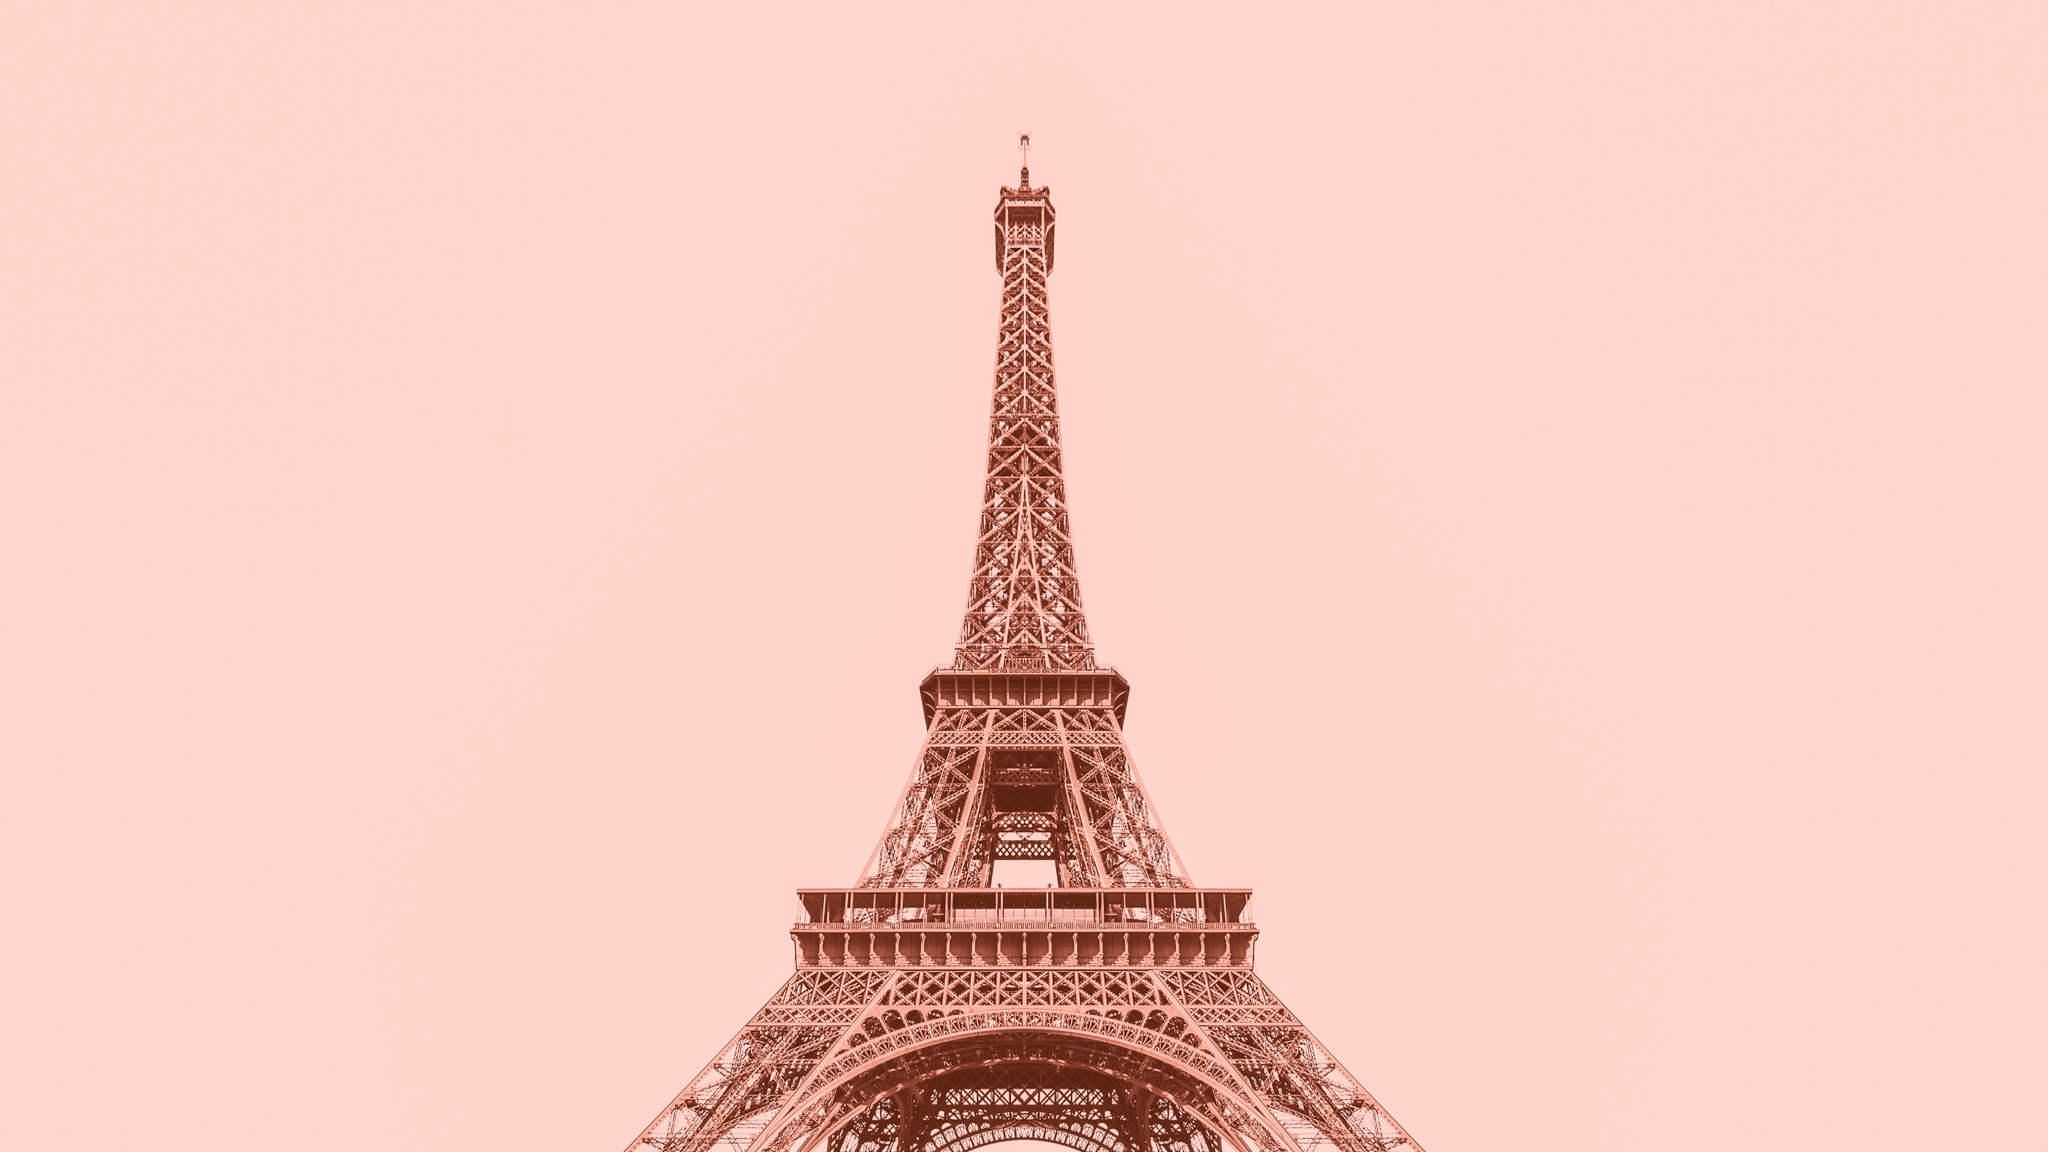 minimalPARIS - La tour Eiffel - zaiczdomokos.com